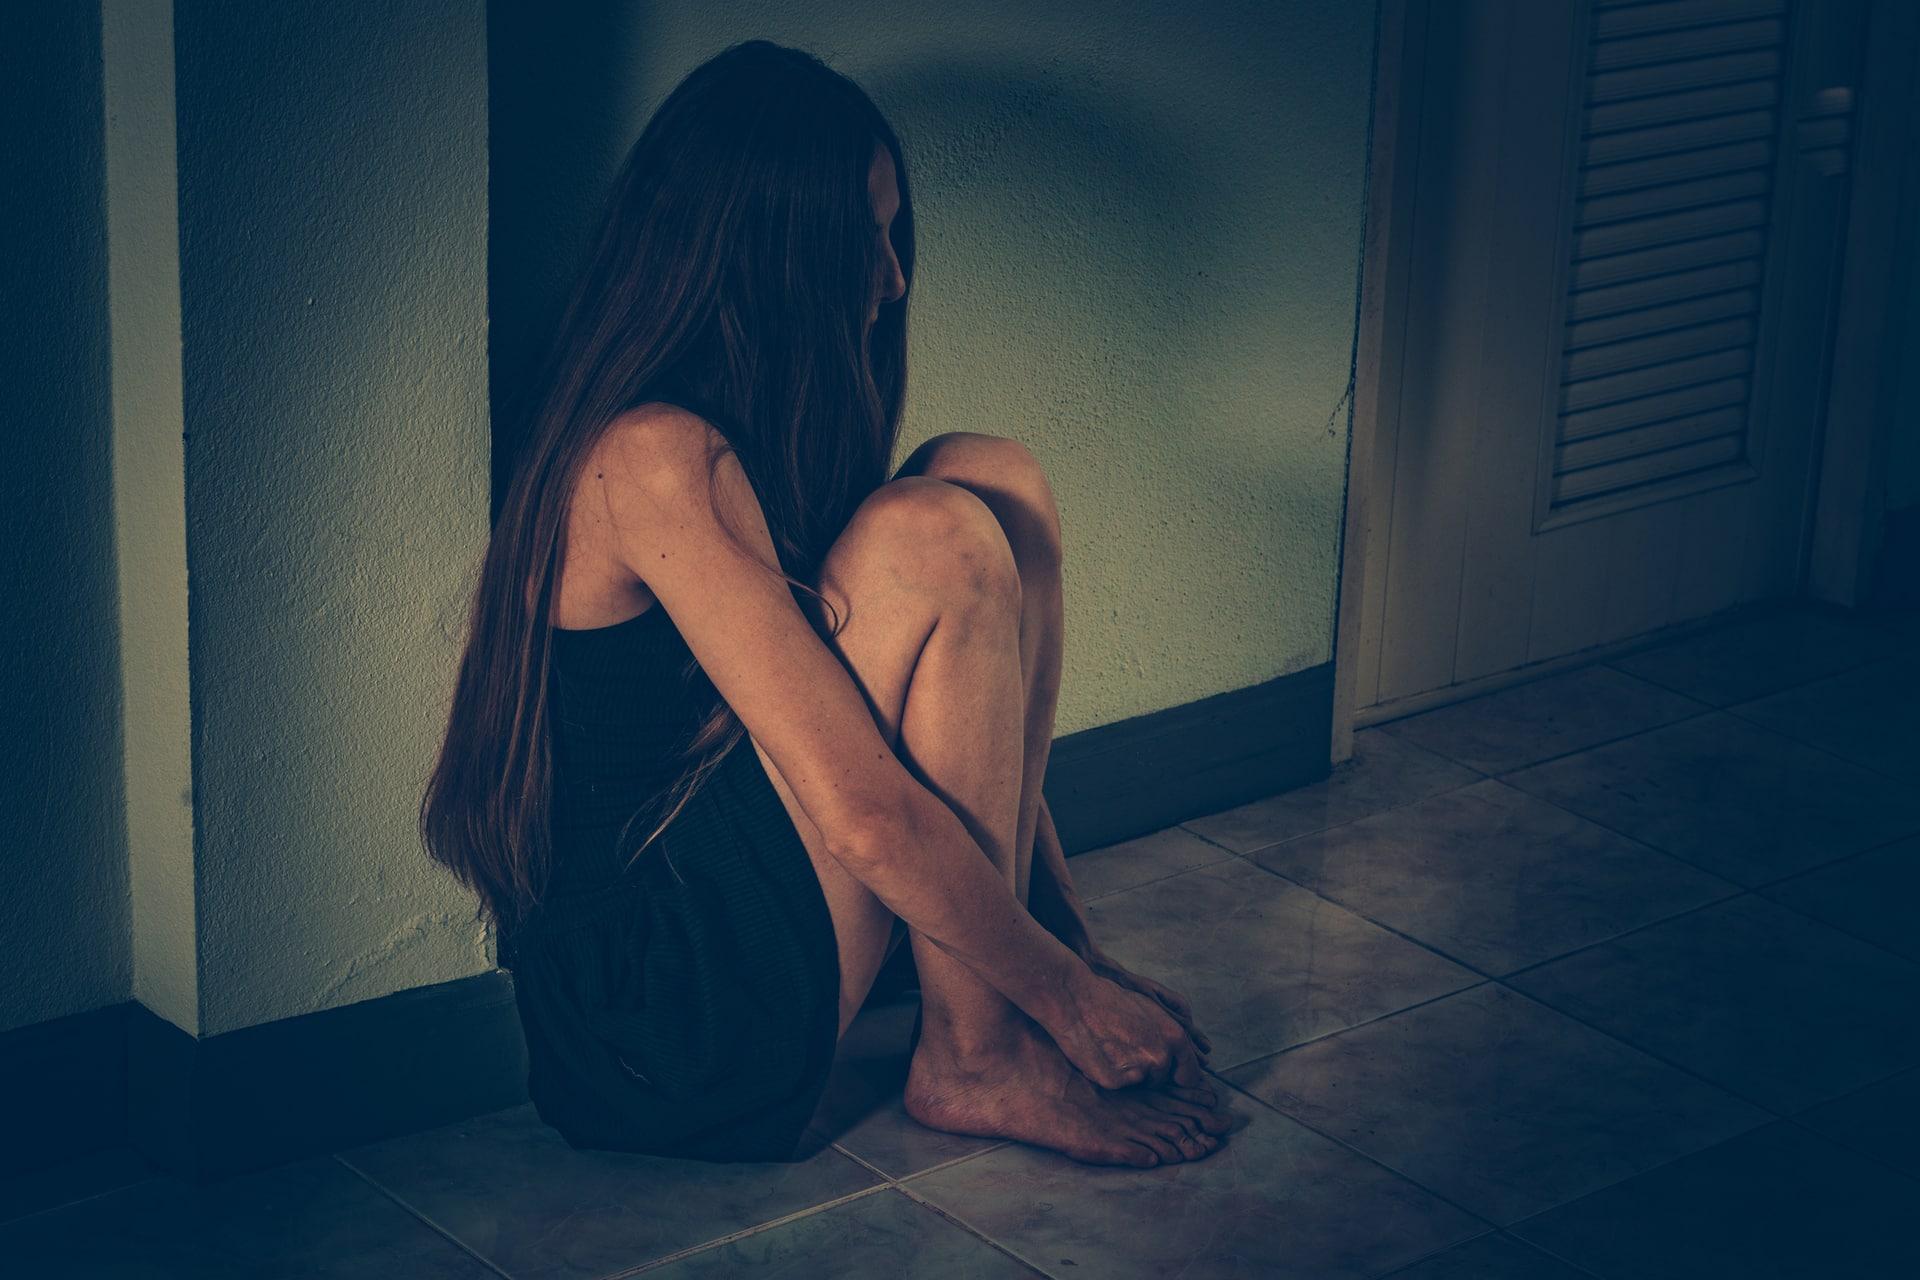 Woman victim. harassment, depression, drug addiction, human trafficking. PTSD post-traumatic stress